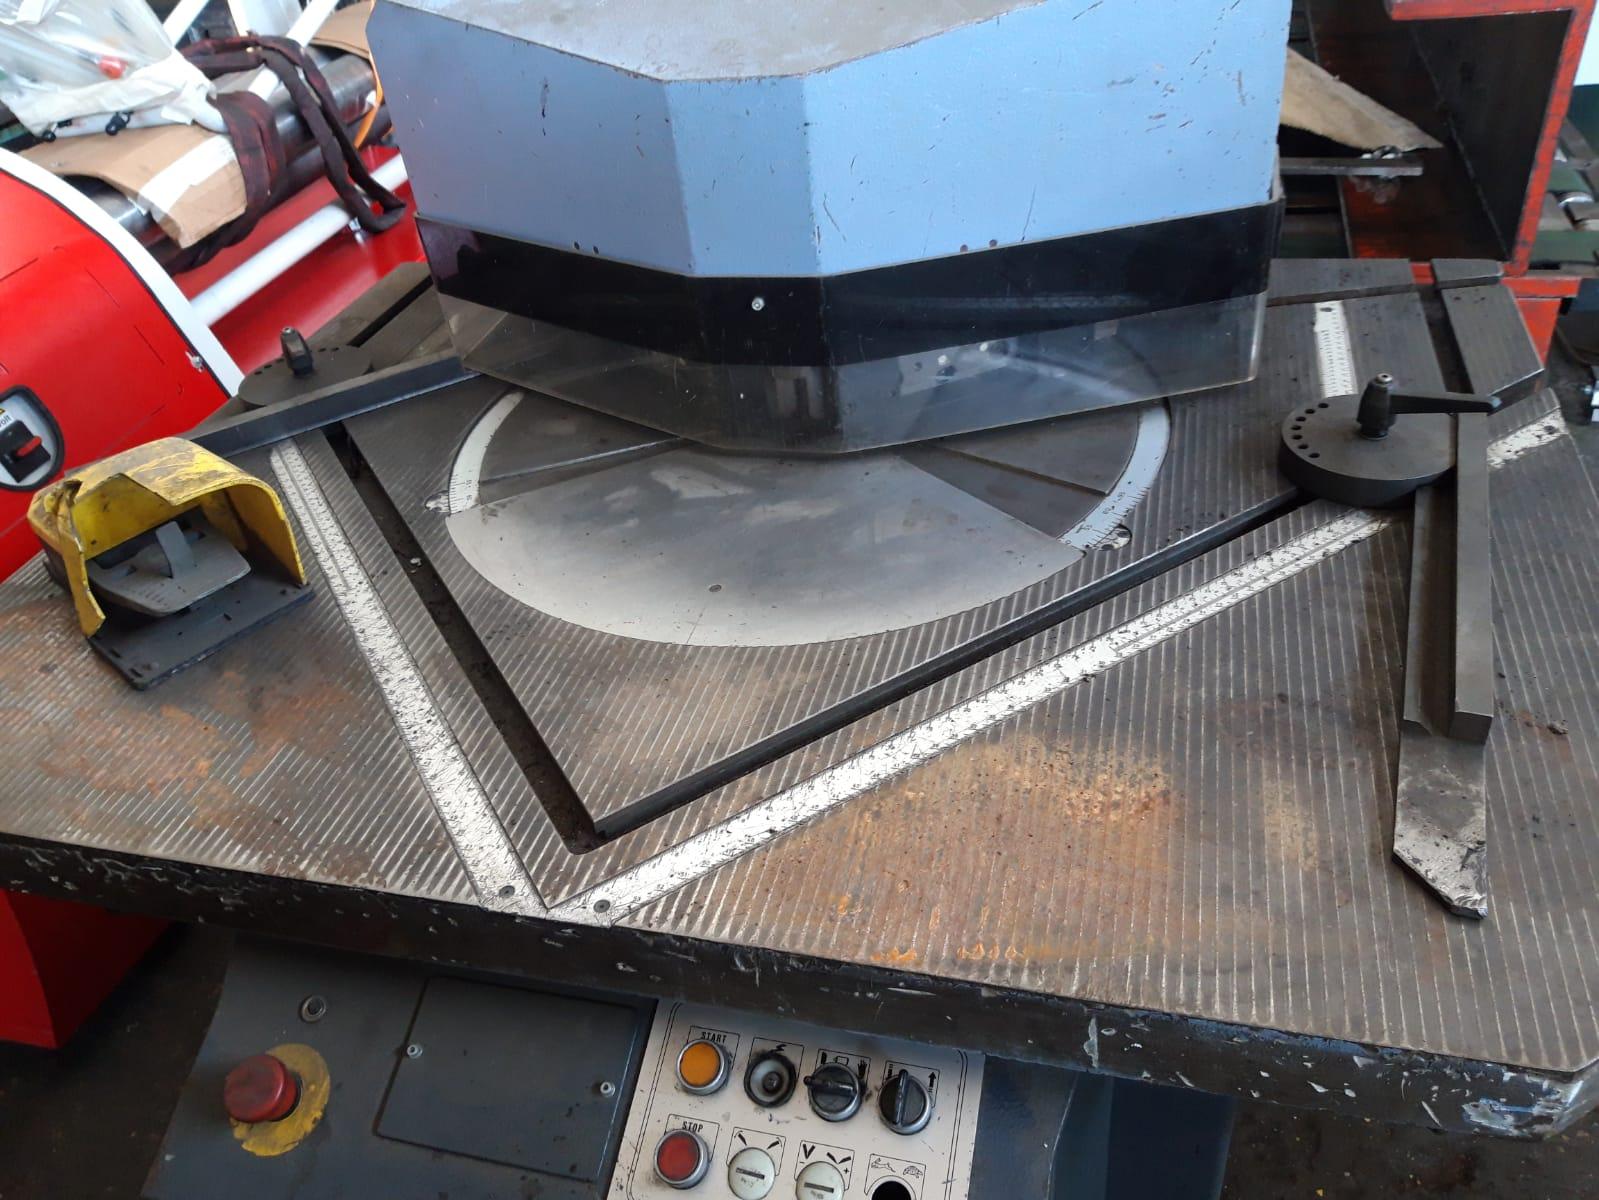 Scantonatrice idraulica Comaca var 250 in vendita - foto 1